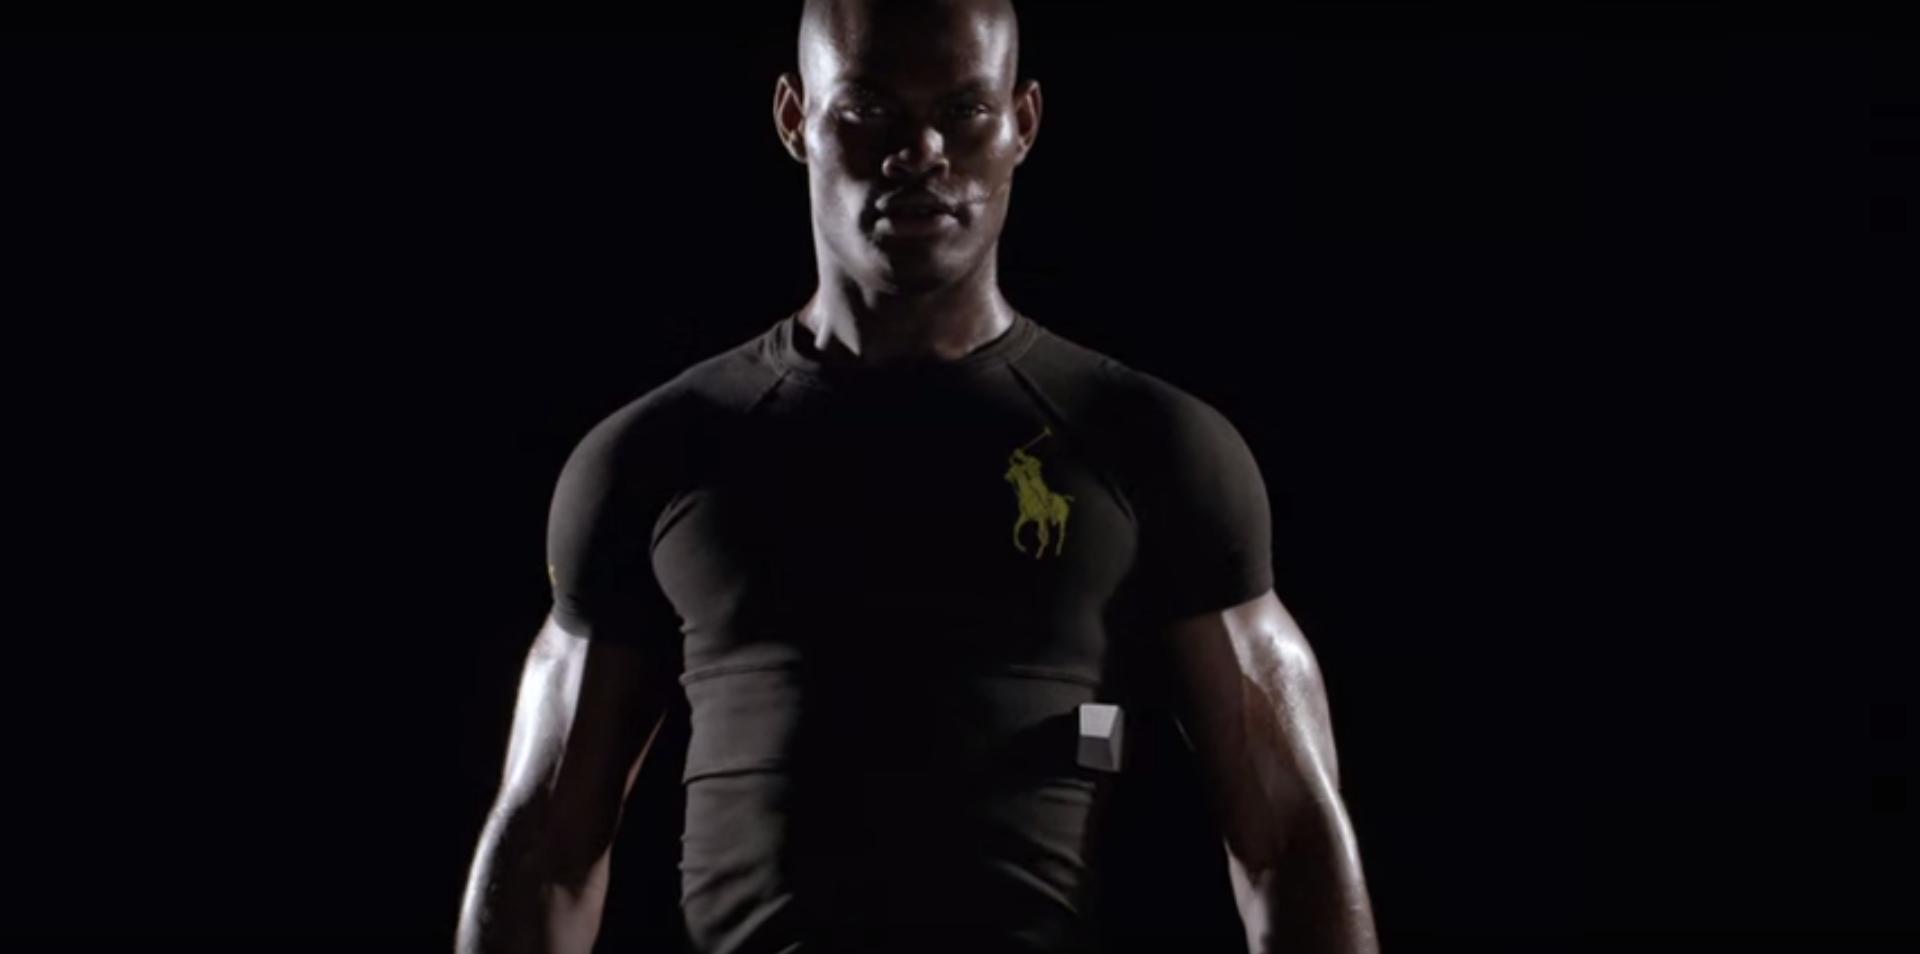 756f144997 Polo Ralph Lauren lanza su propia camiseta inteligente